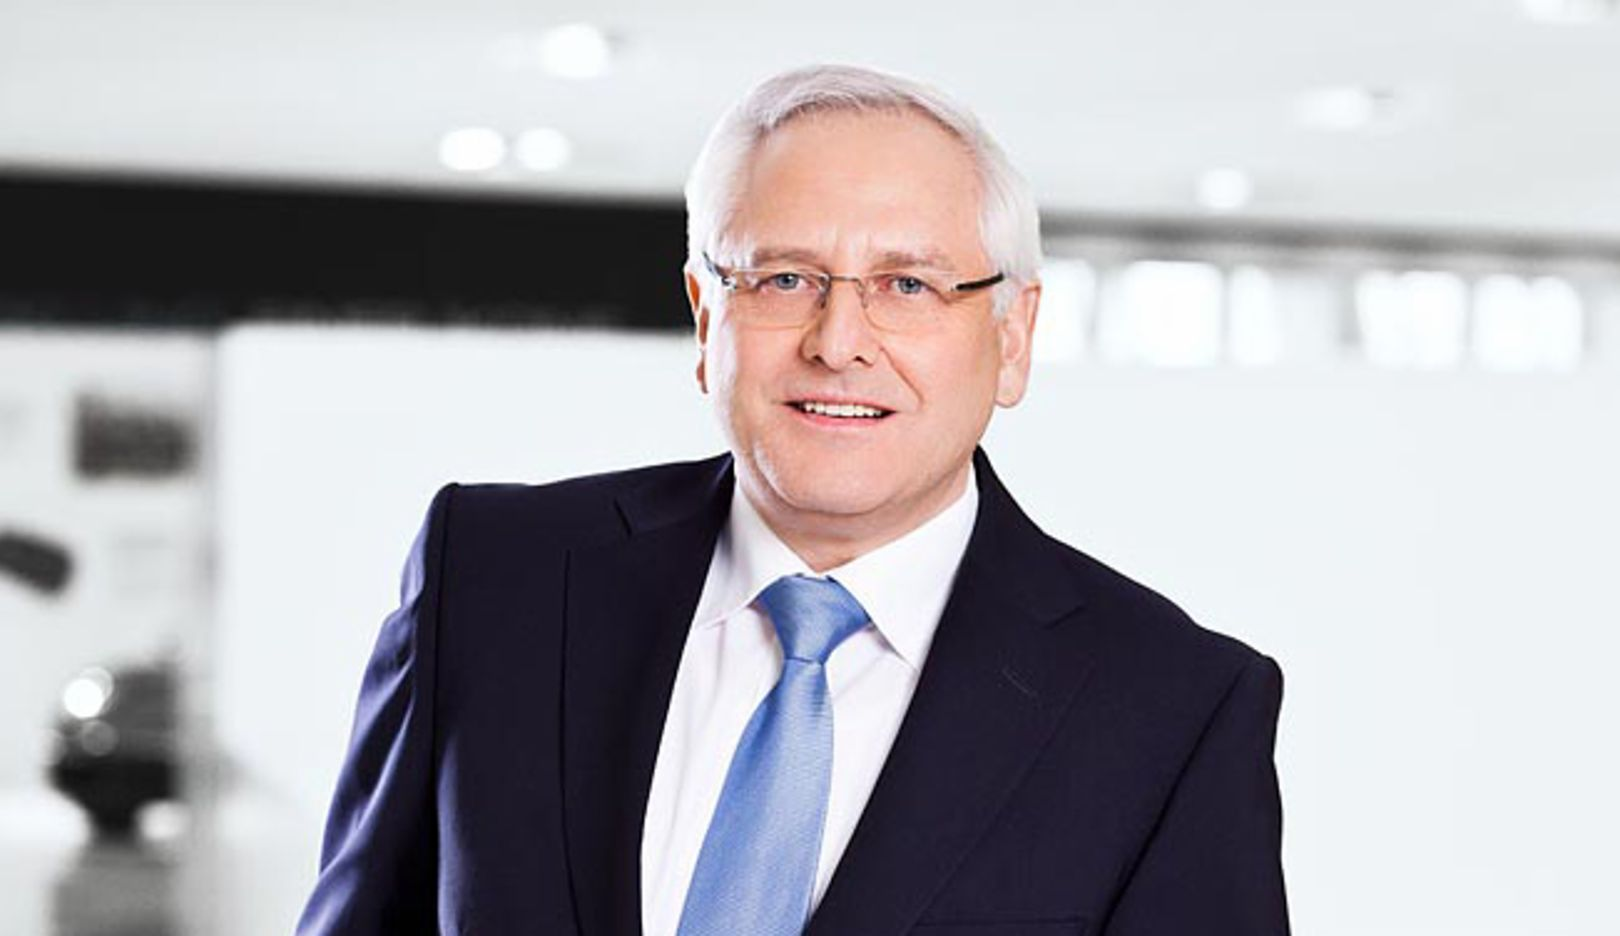 Uwe-Karsten Staedter, Member of the Executive Board, Procurement, 2014, Porsche AG